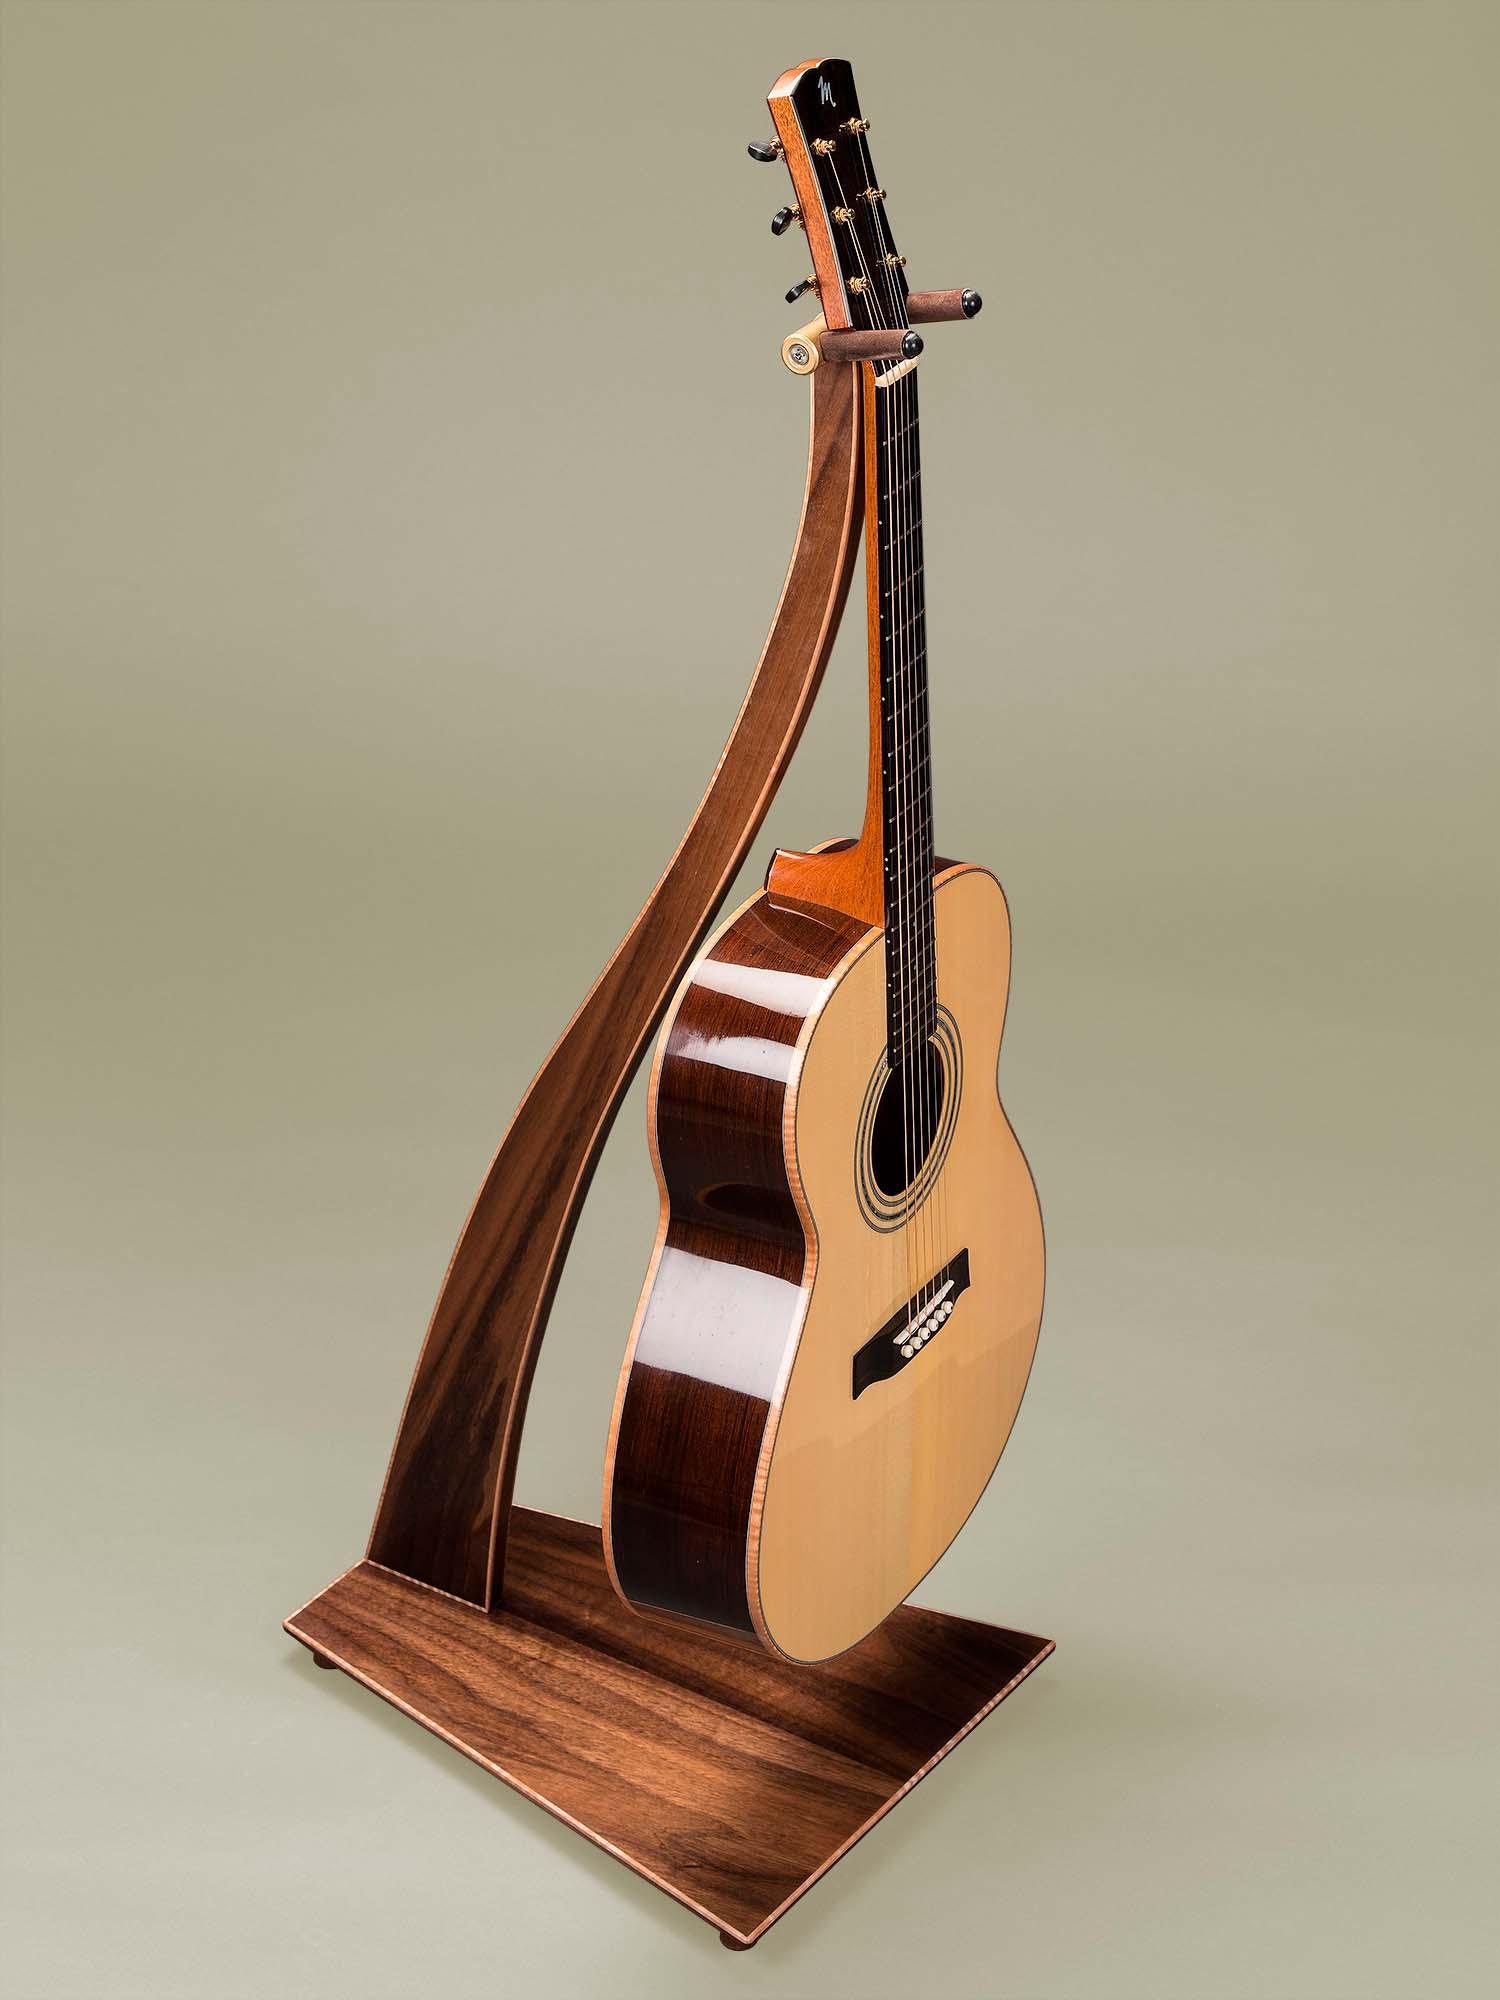 sm design guitar stands by take a stand. Black Bedroom Furniture Sets. Home Design Ideas